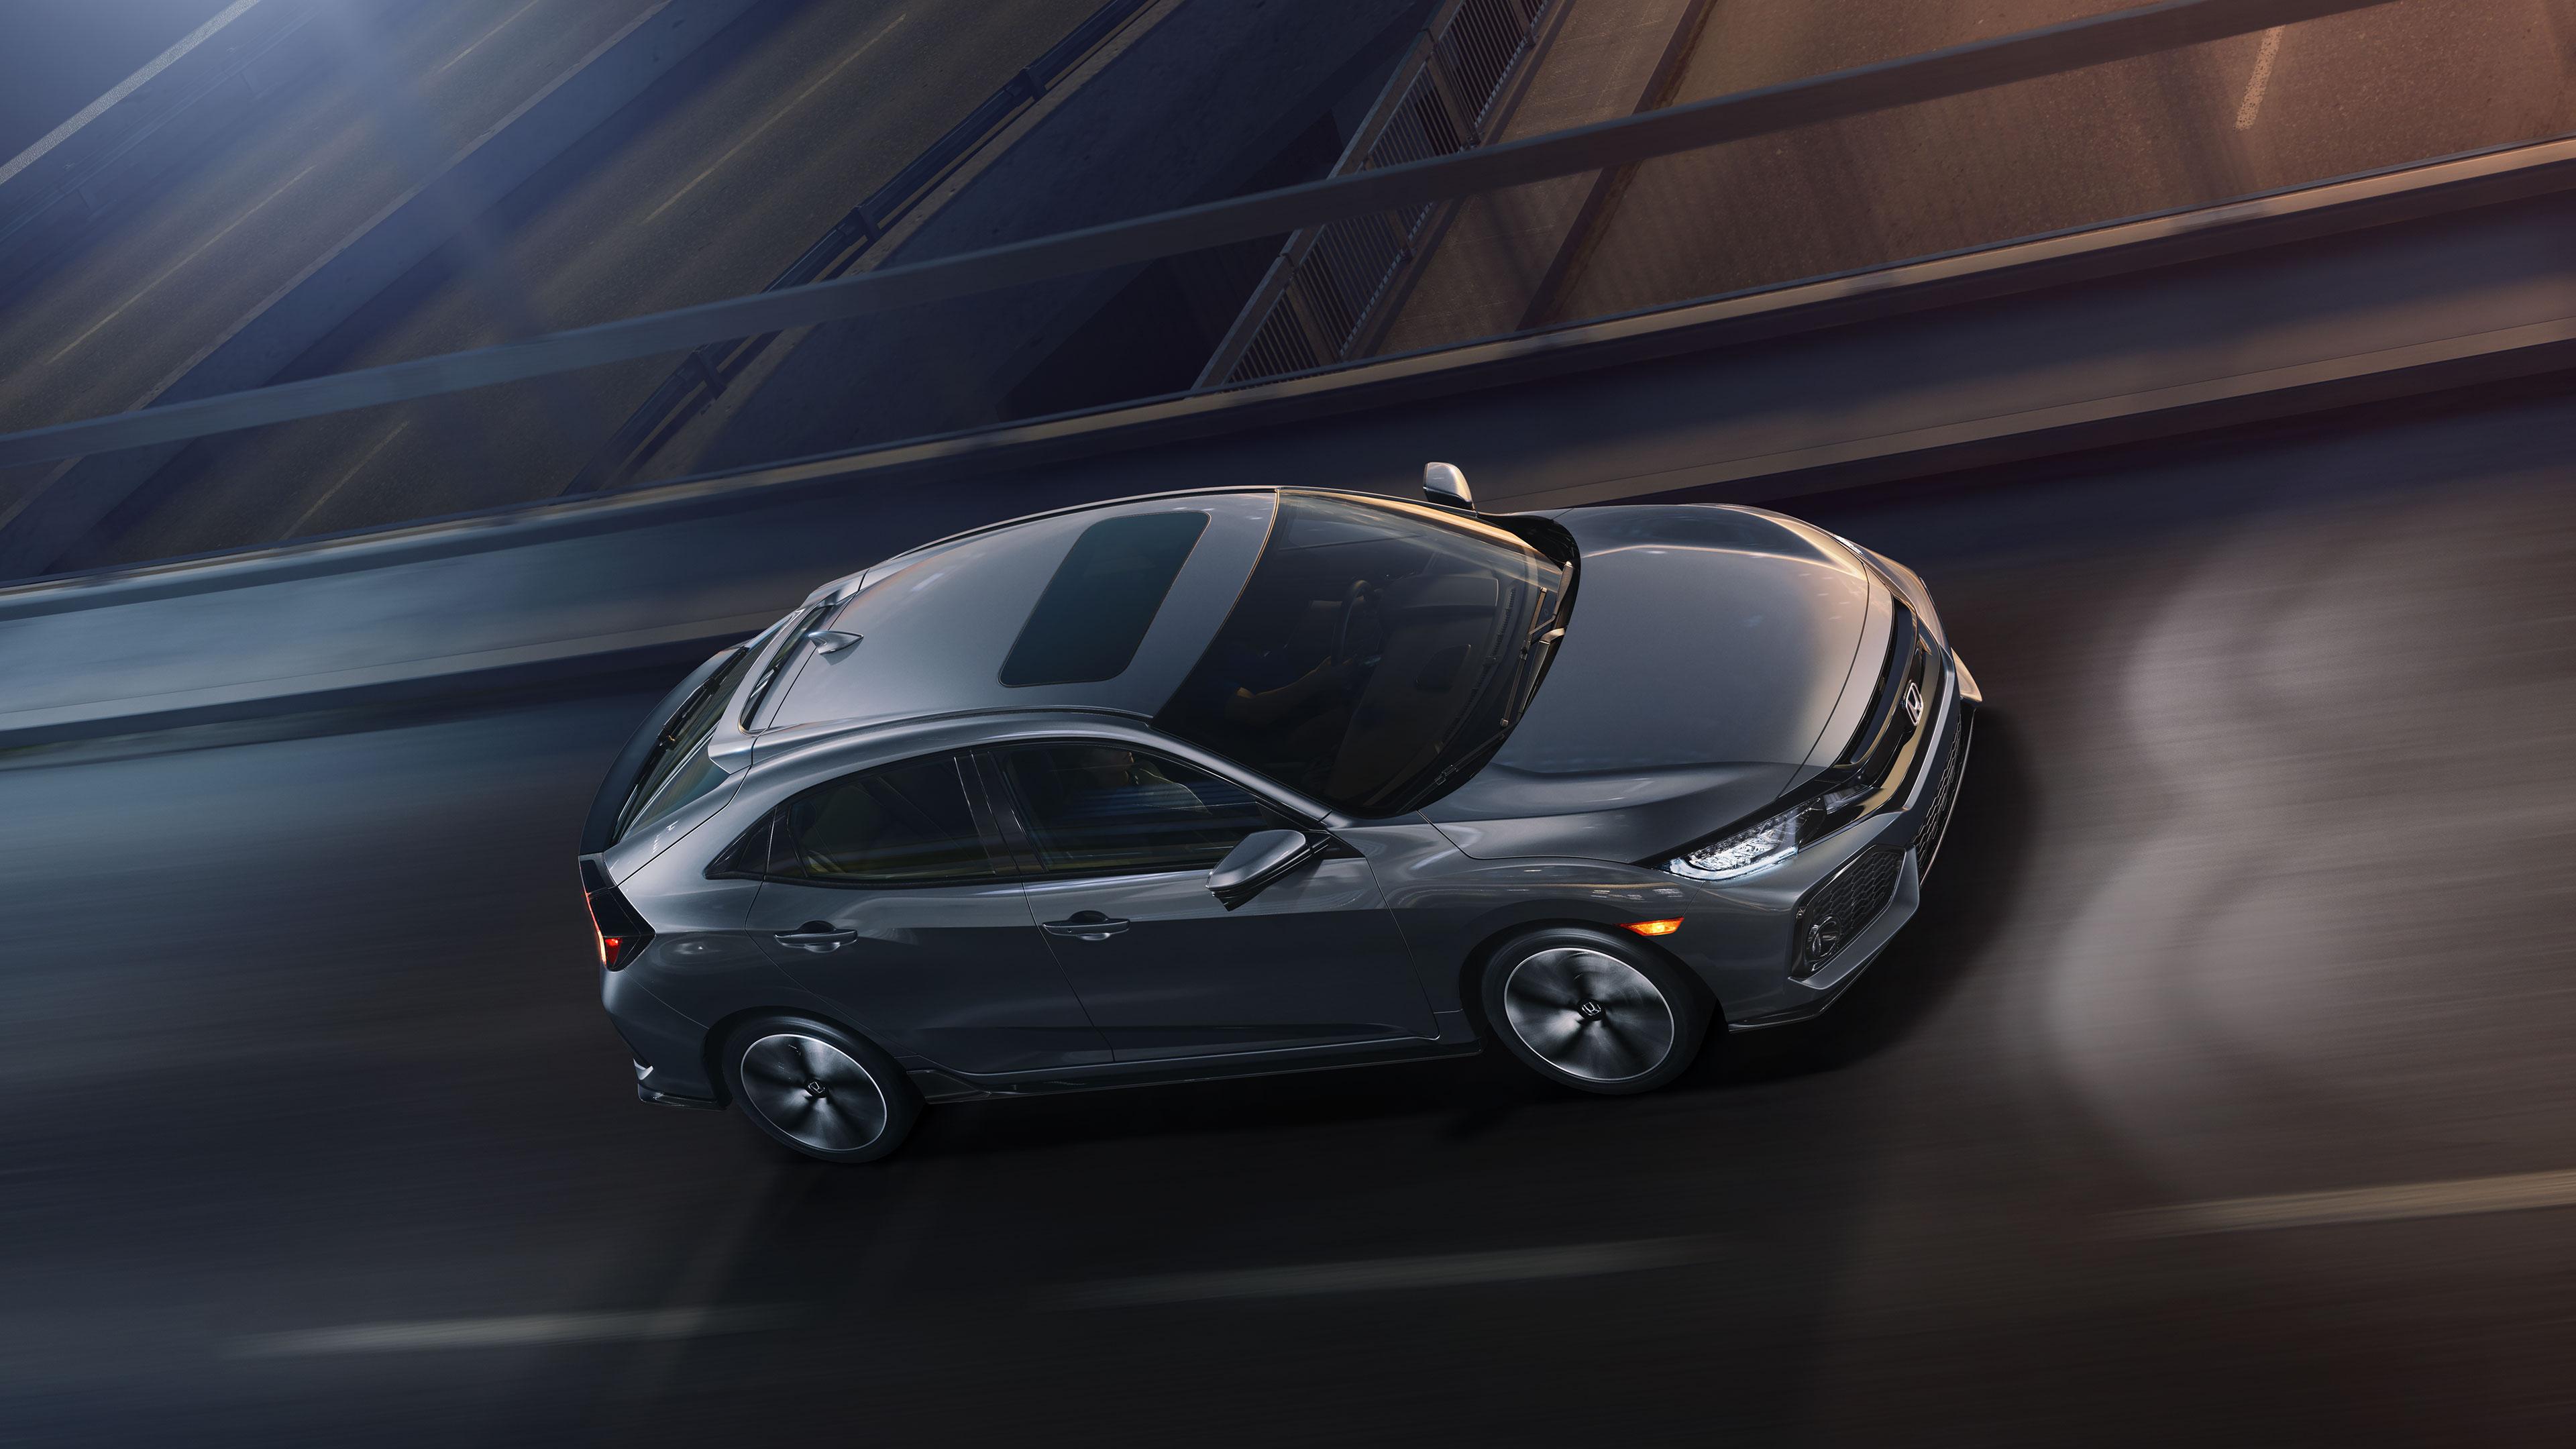 Honda Civic 2017 Exterior Touring